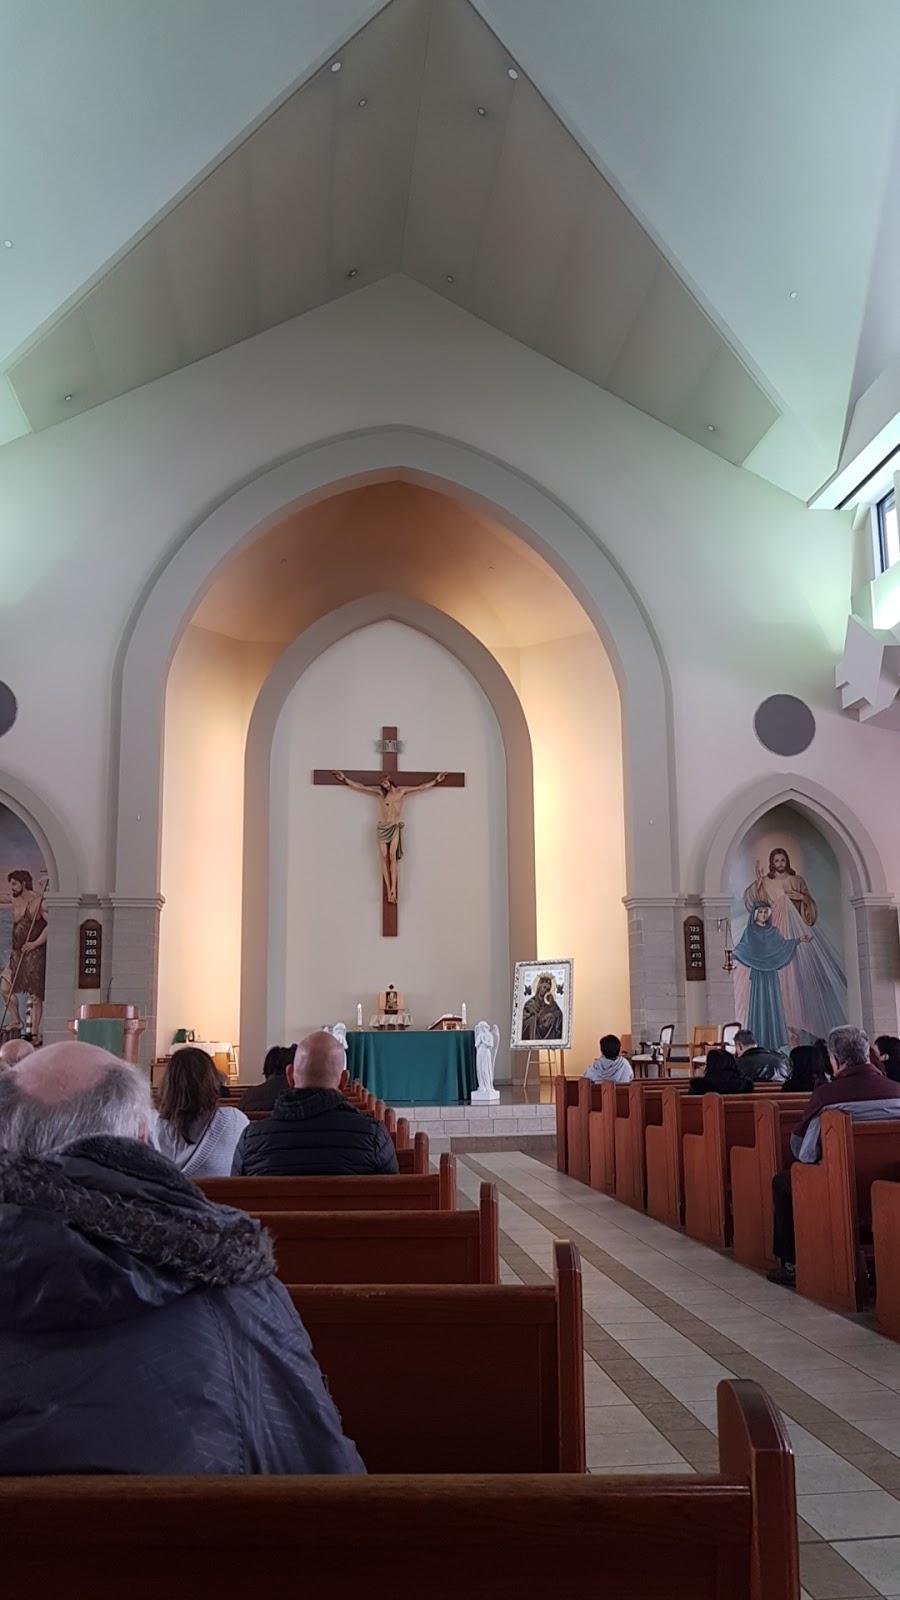 Merciful Redeemer Parish | church | 2775 Erin Centre Blvd, Mississauga, ON L5M 5W2, Canada | 9058120030 OR +1 905-812-0030